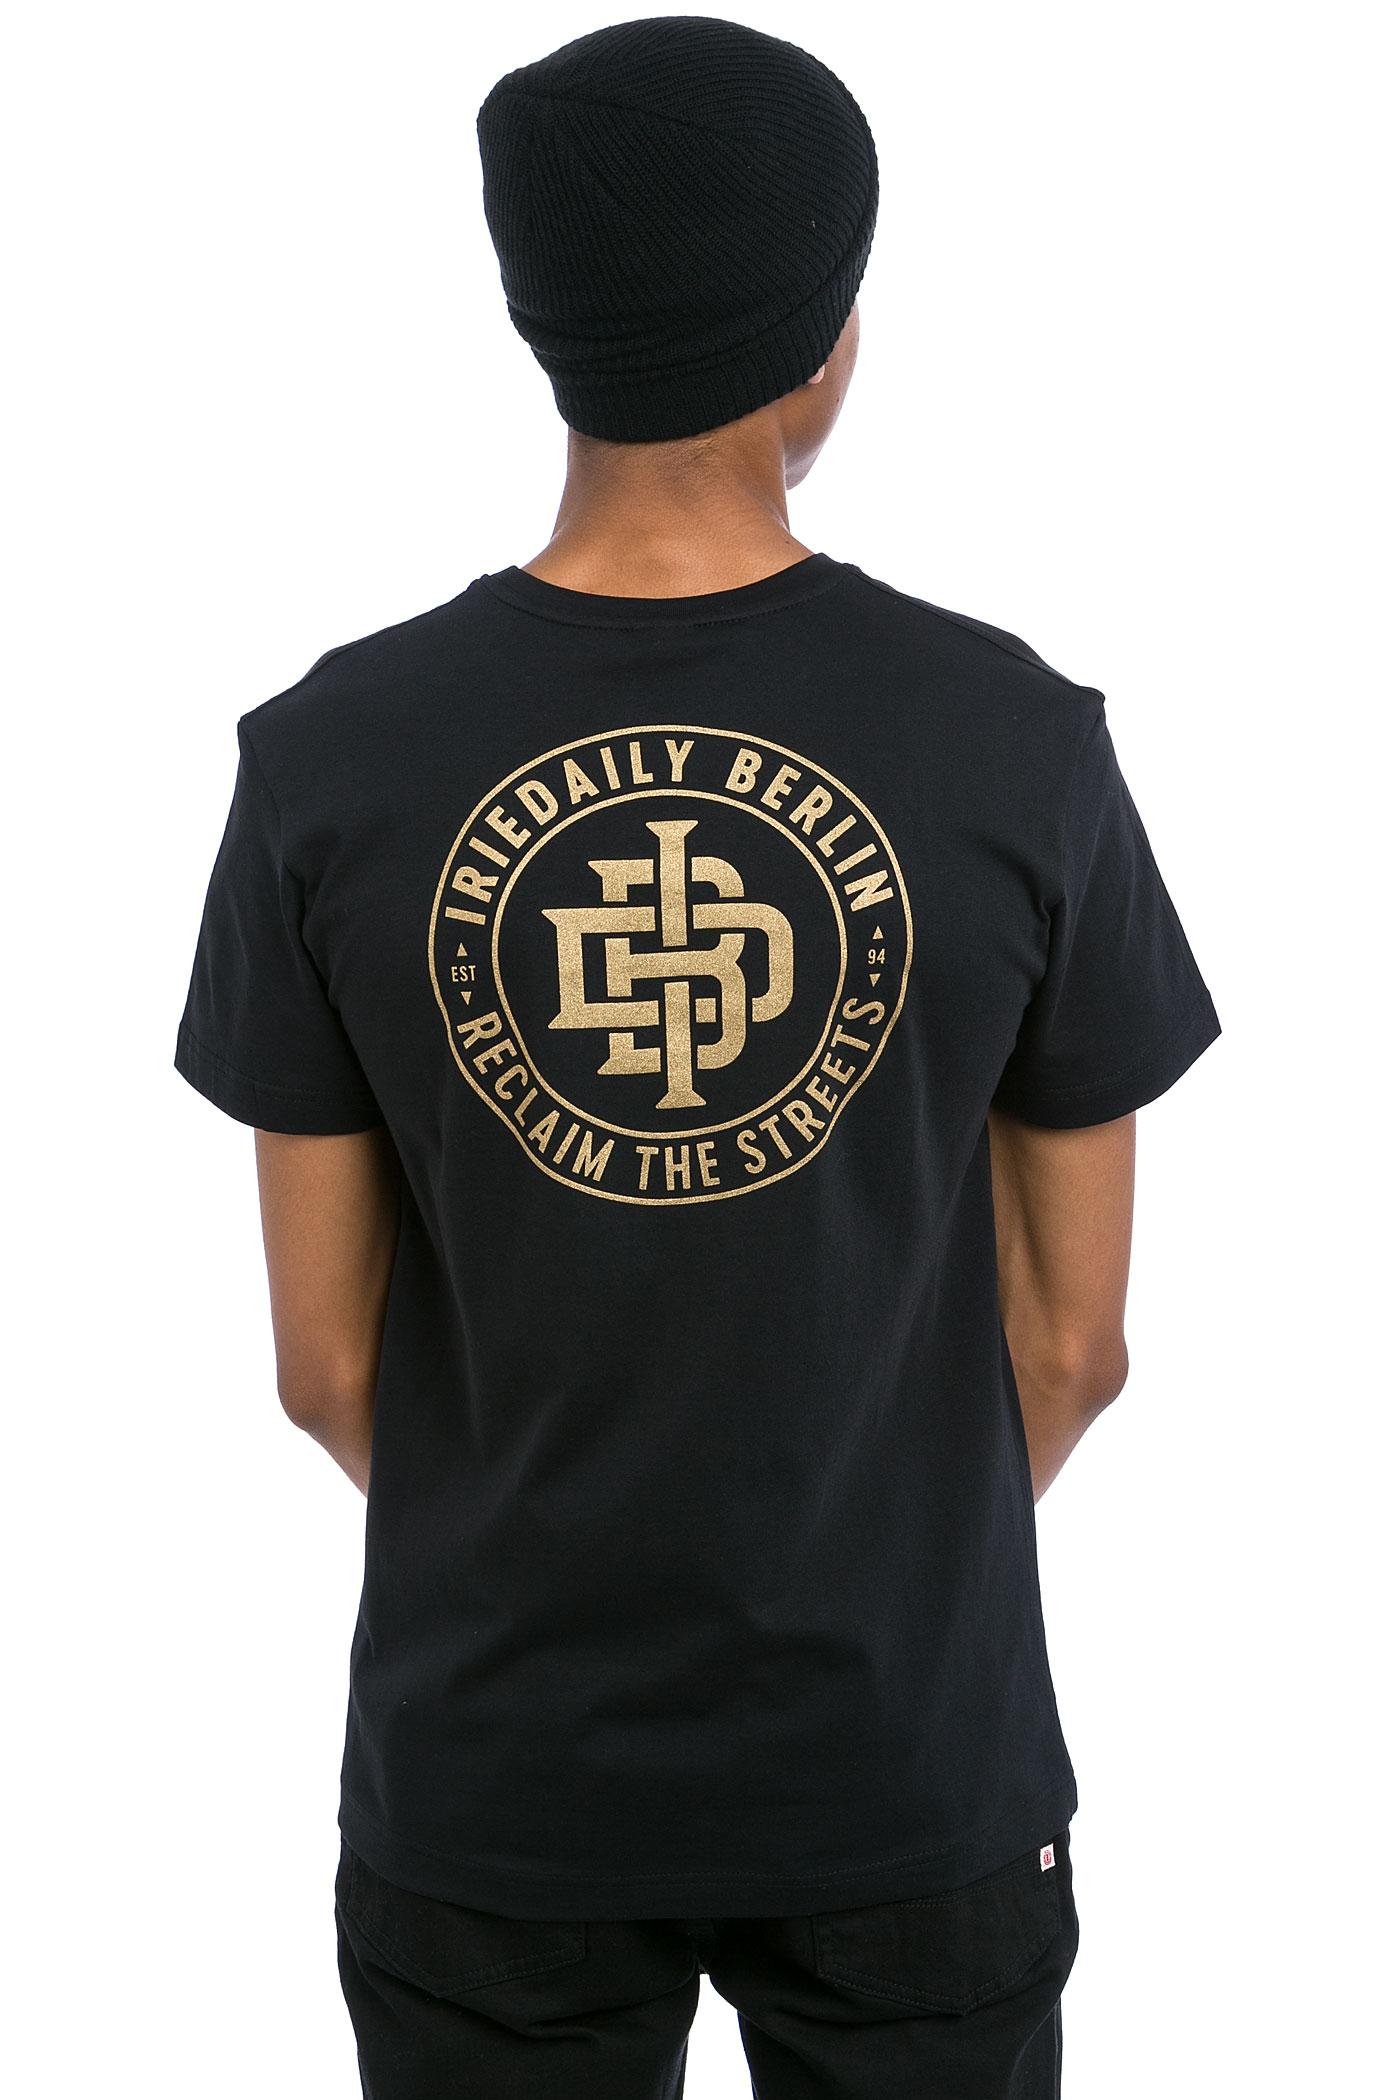 iriedaily reclaim t shirt black buy at skatedeluxe. Black Bedroom Furniture Sets. Home Design Ideas